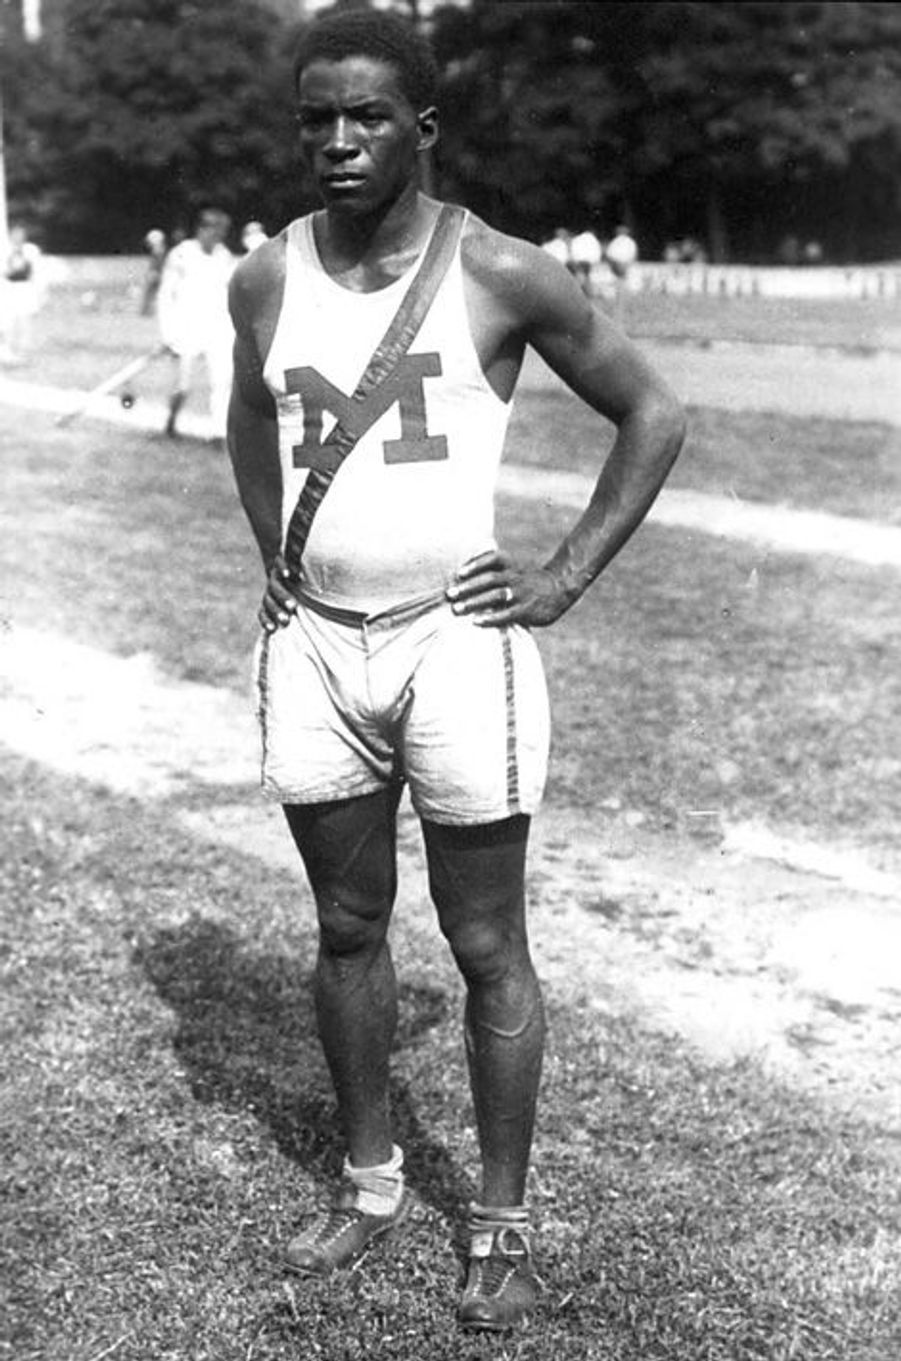 Le coureur Amer Hubbard, 1924.